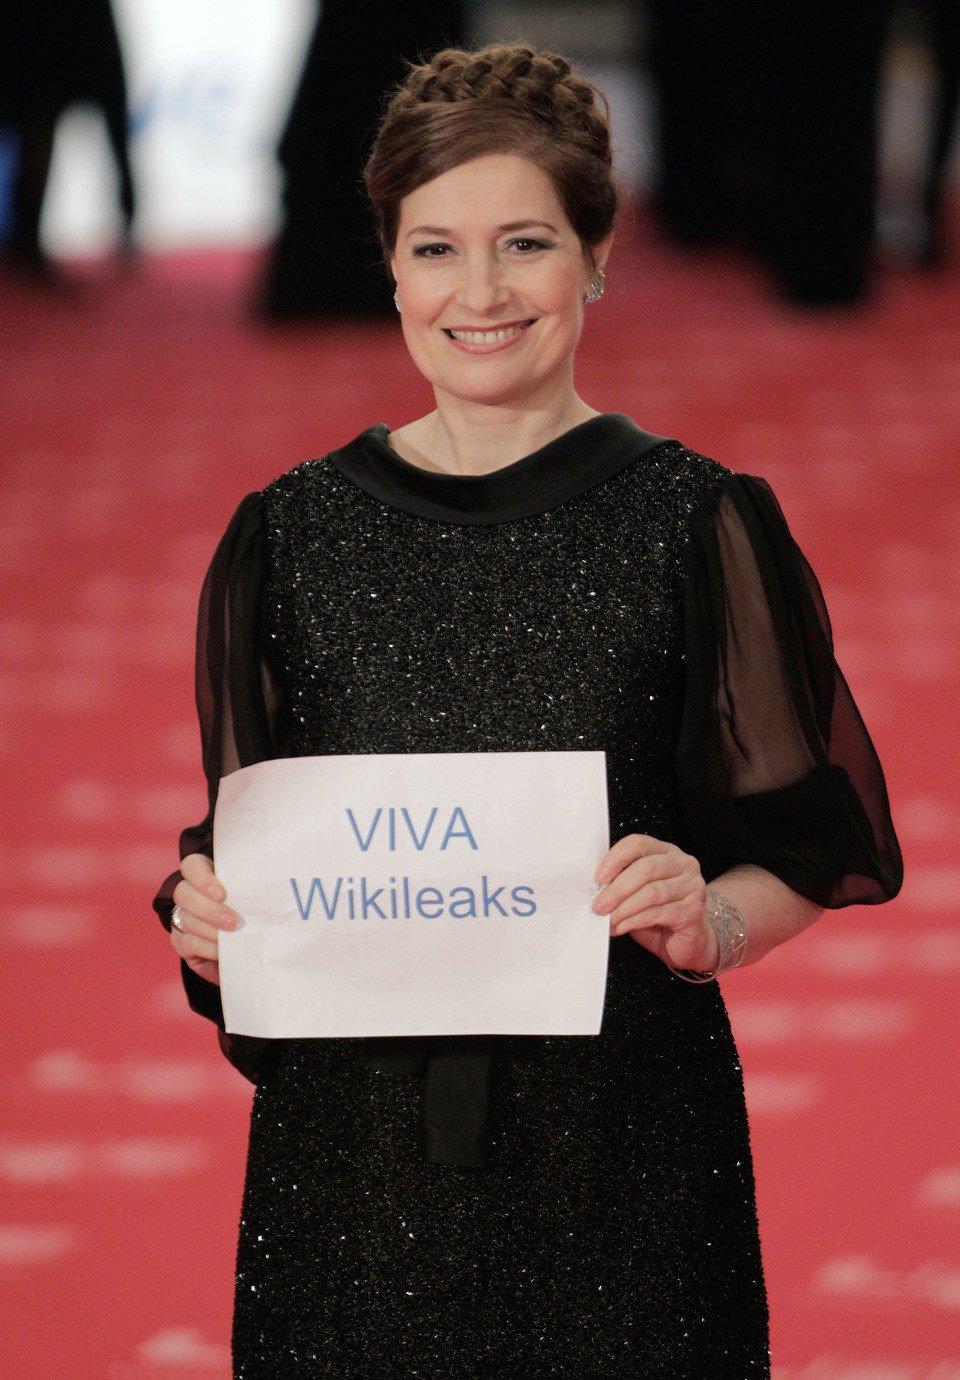 Assumpta Serna: Viva Wikileaks en los Goya 2011